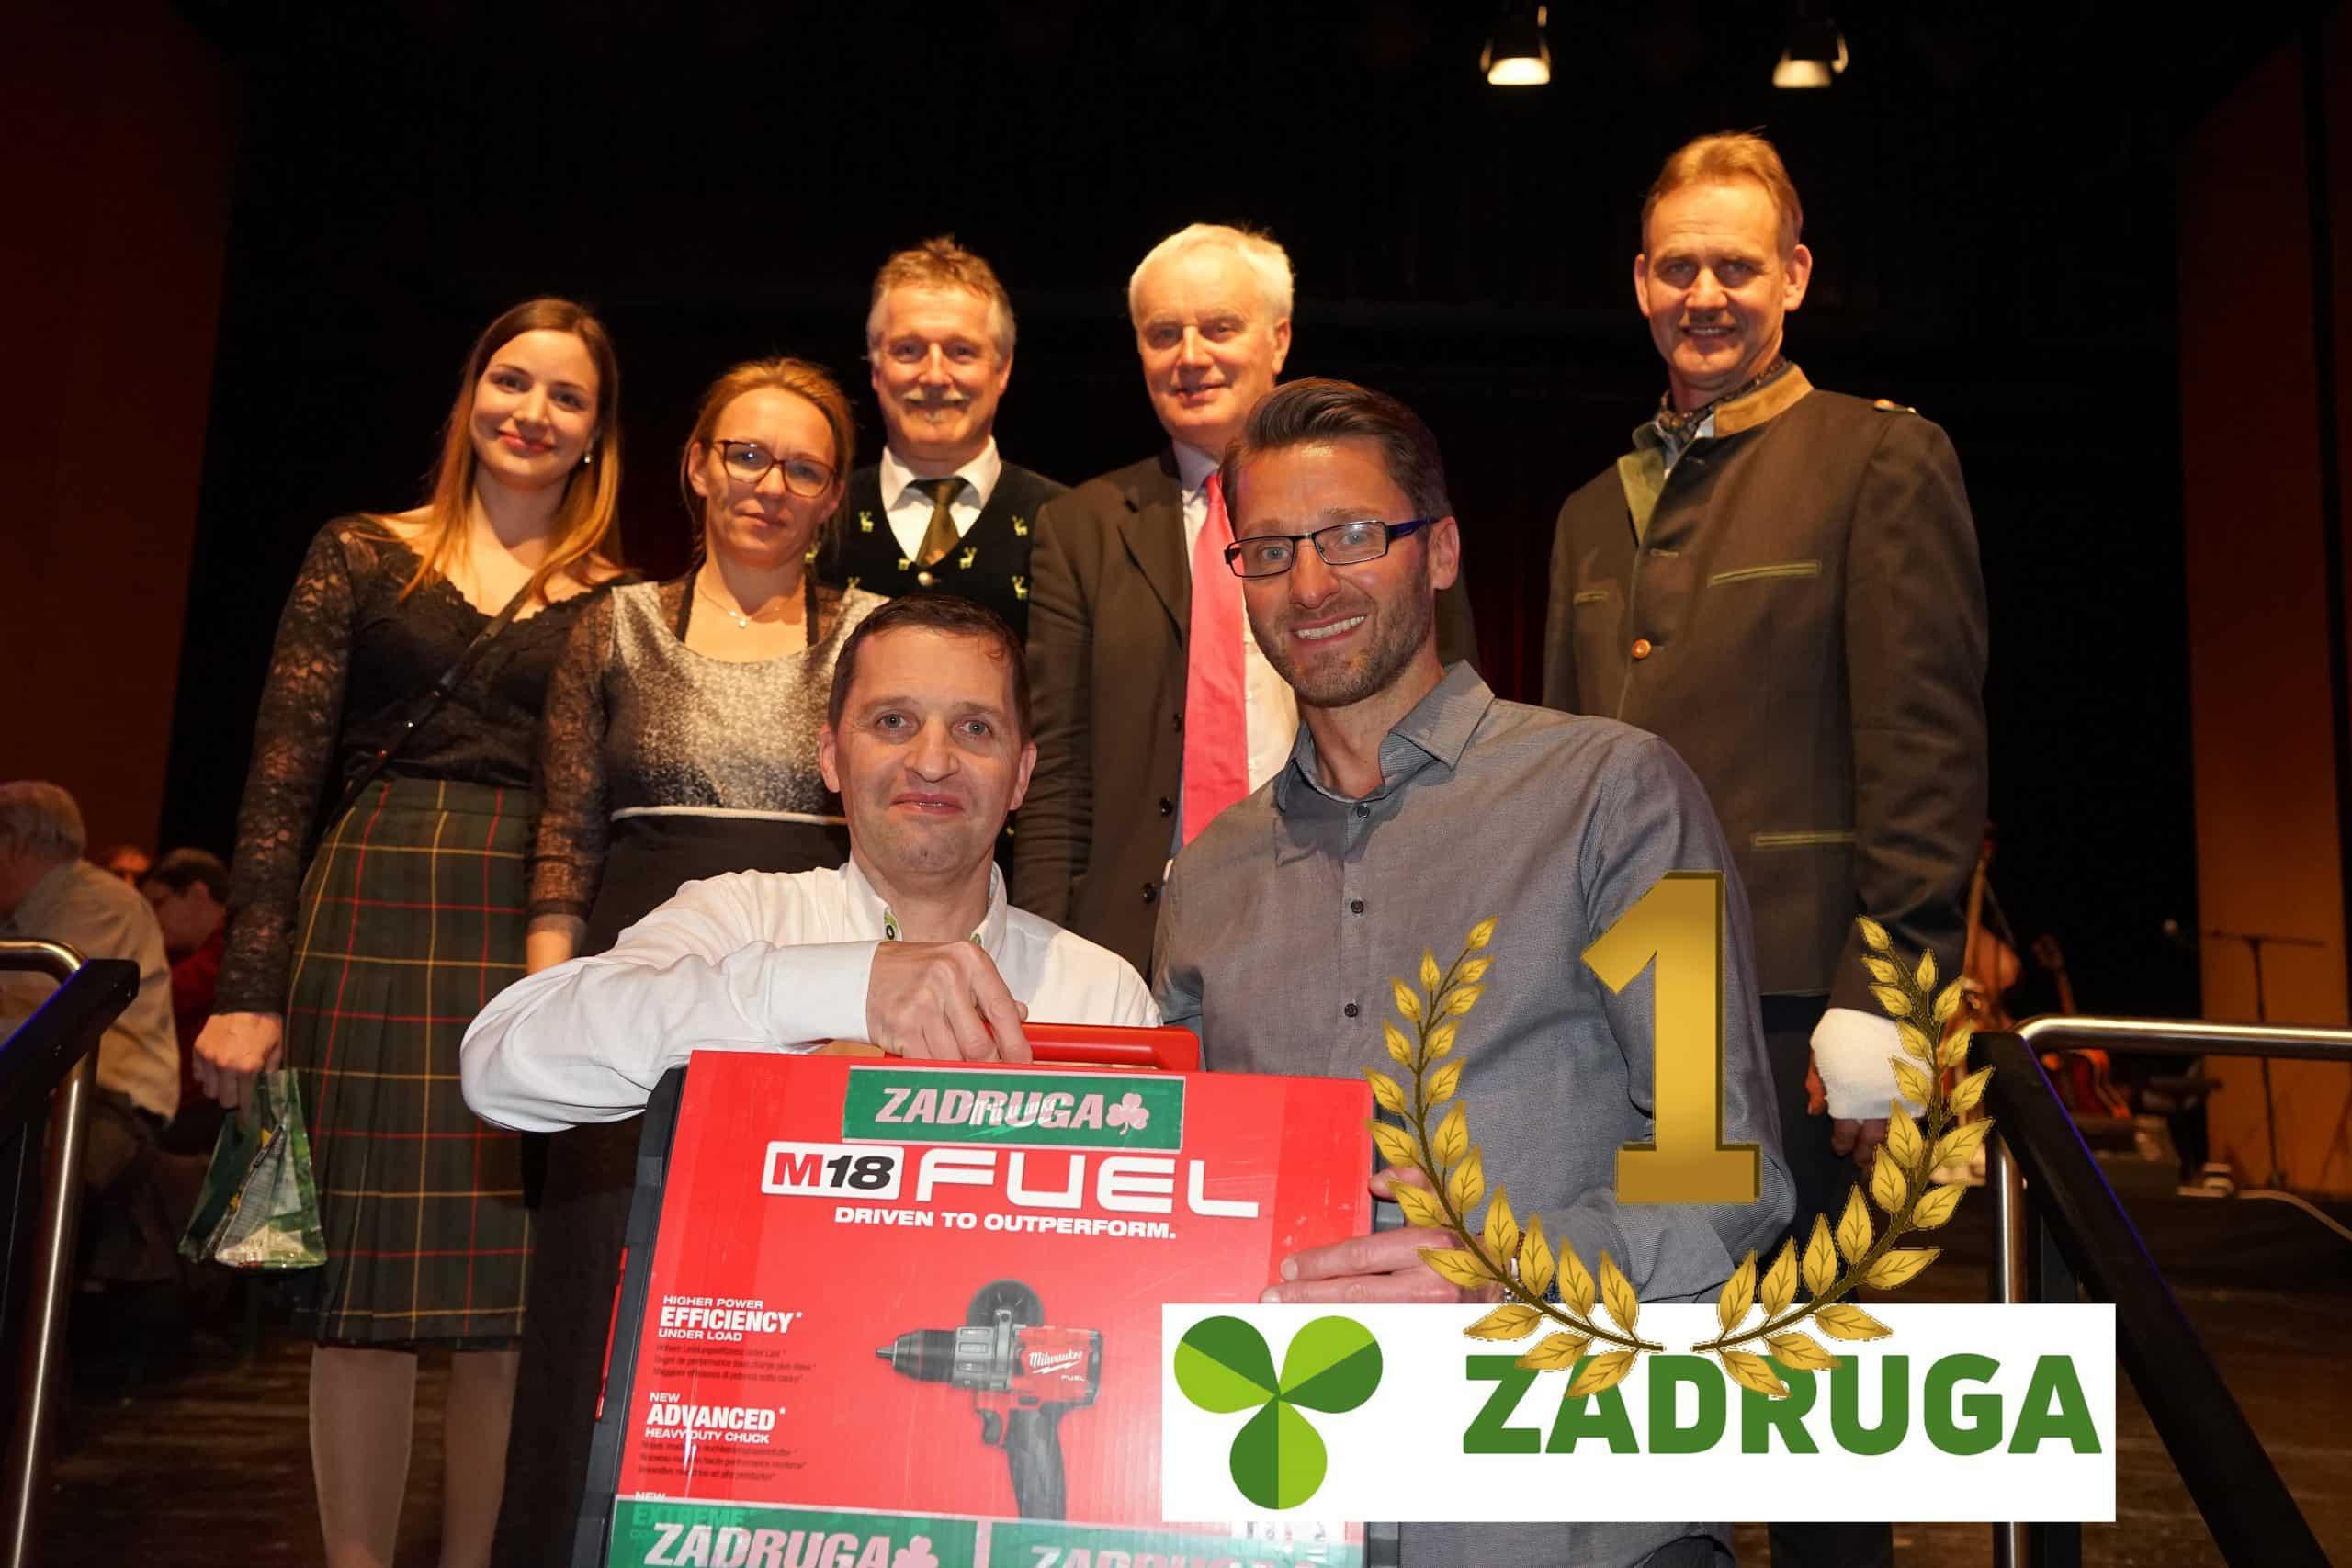 Ples SJK prva nagrada Hoffmann Zadruga_bearbeitet-1